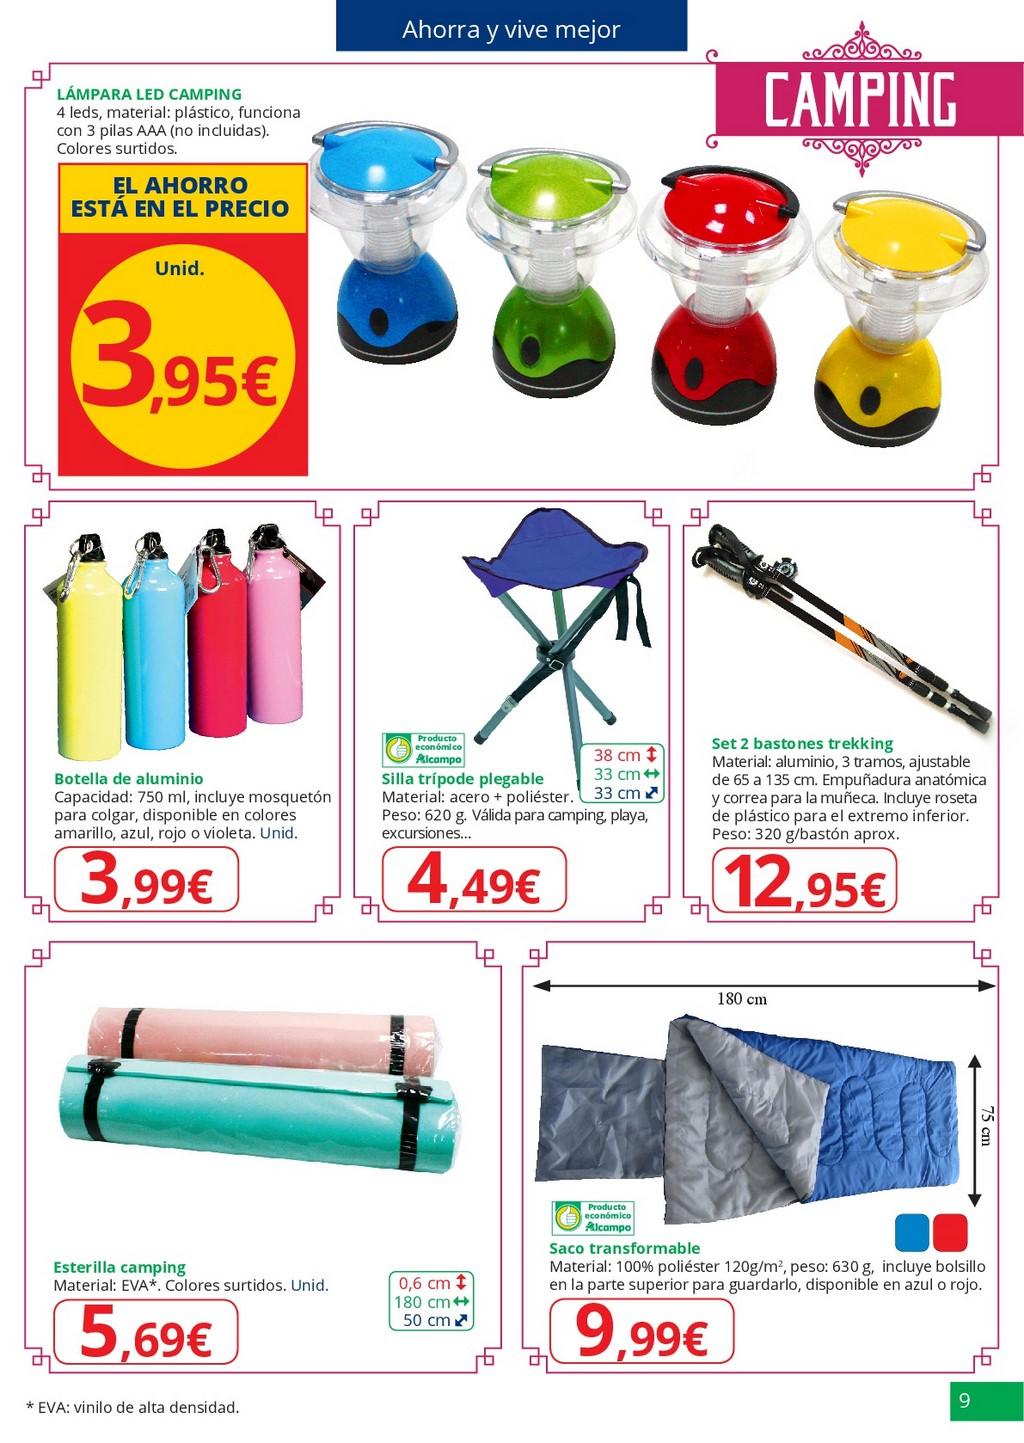 Especial jardin9 for Jardin alcampo 2016